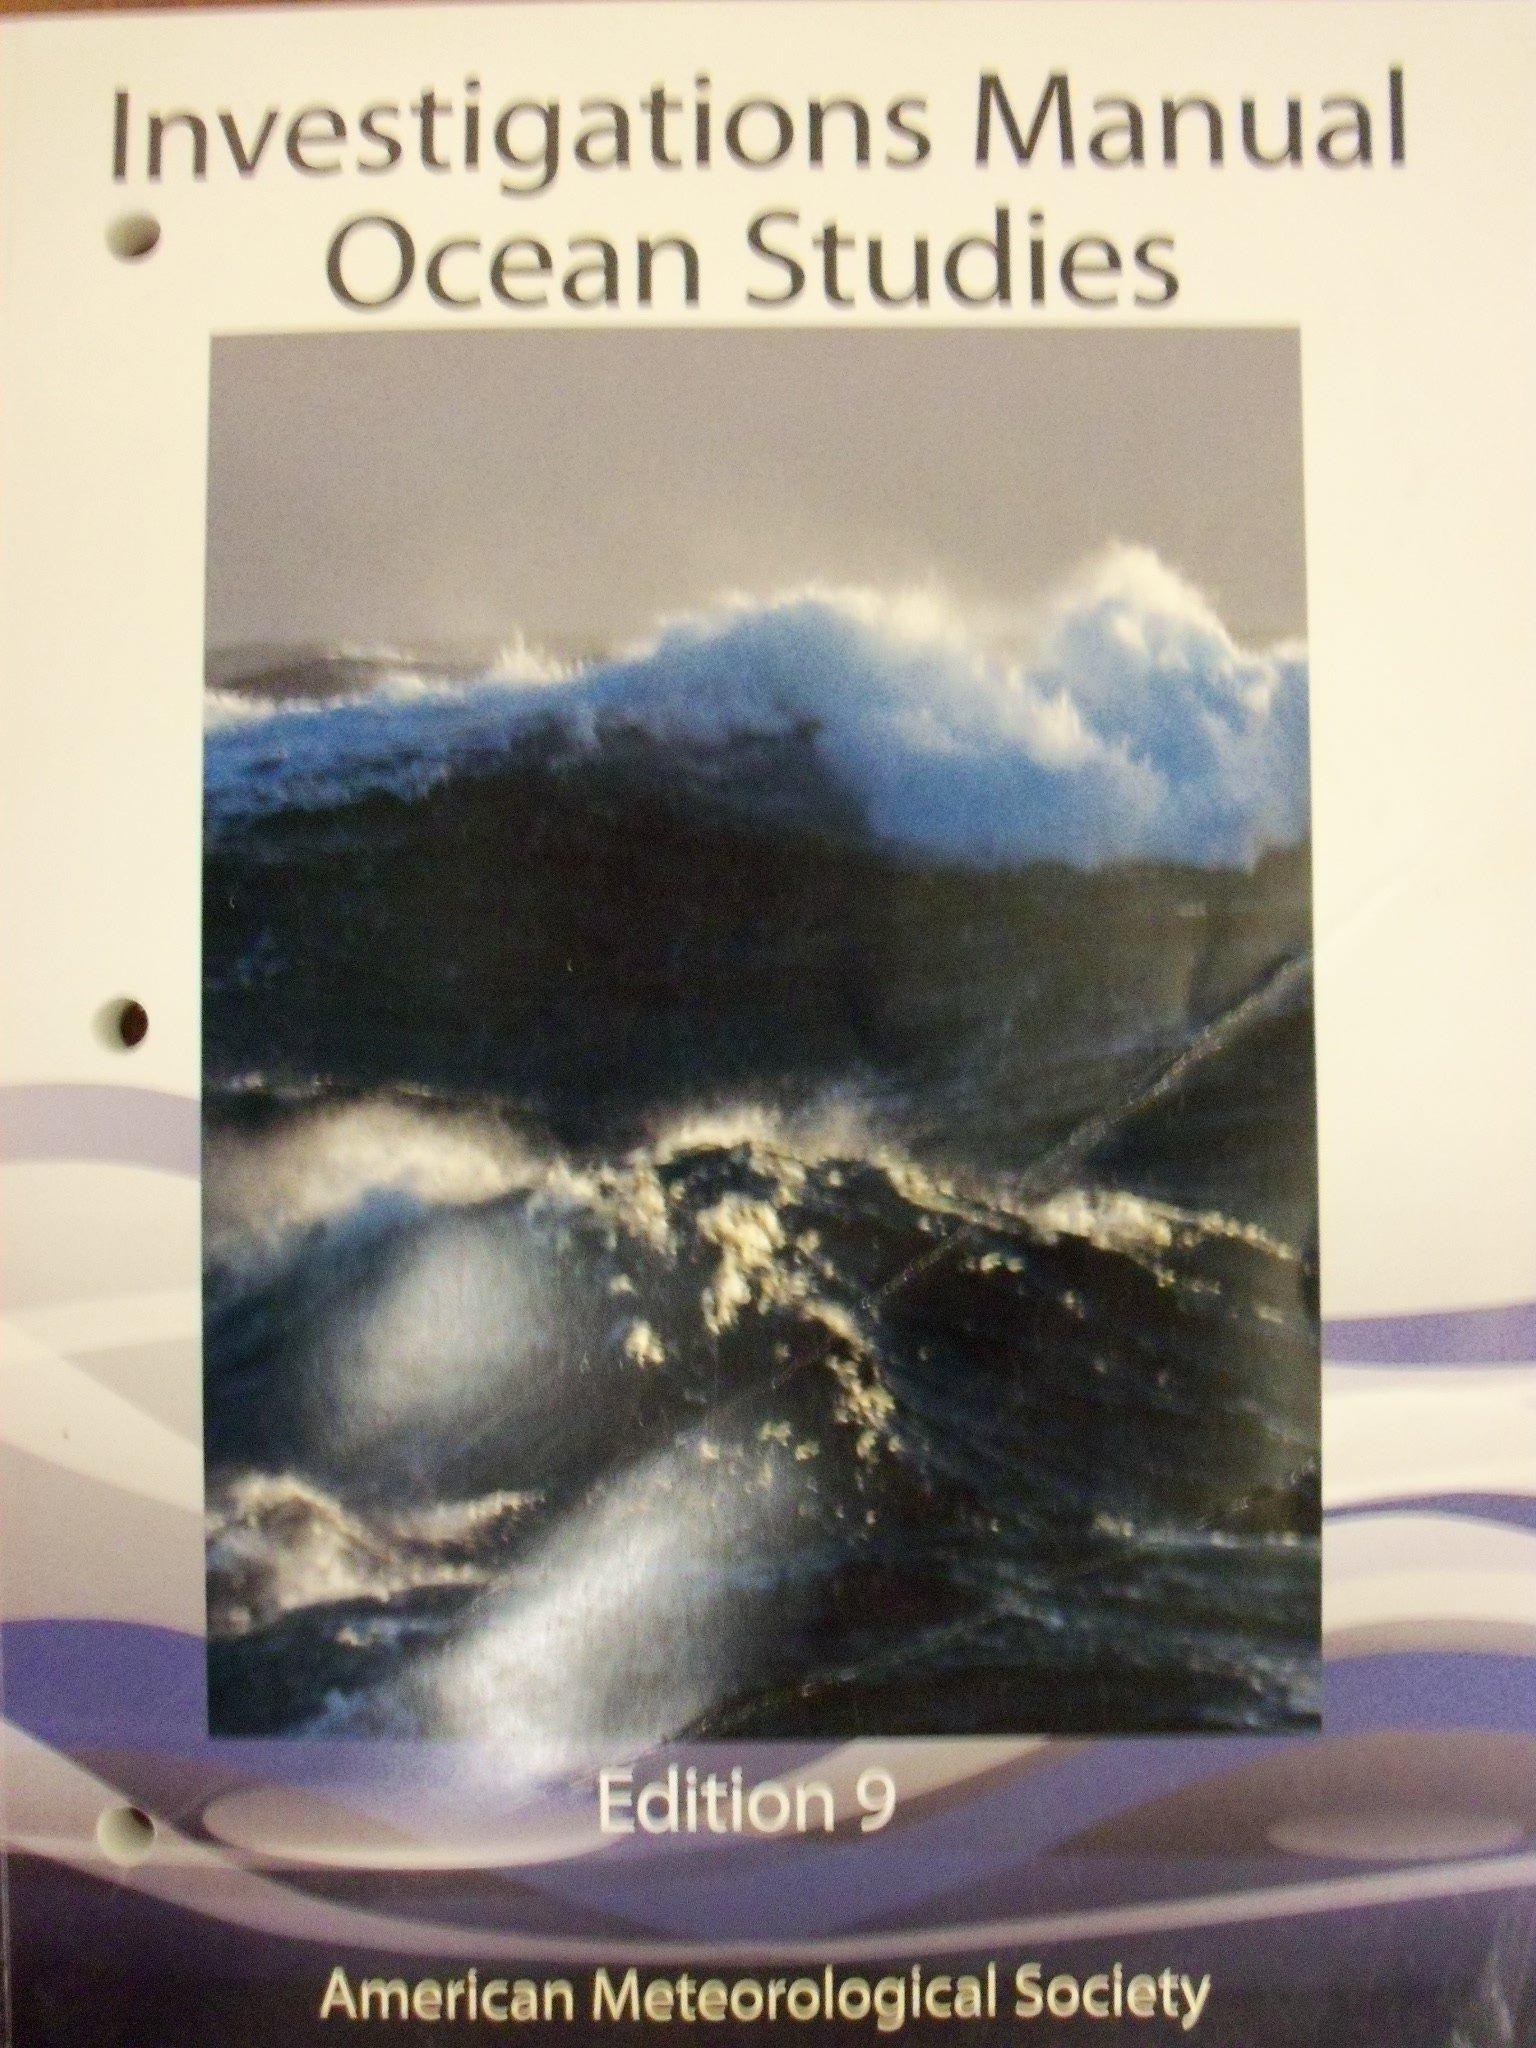 Ocean Studies Investigations Manual 9th Edition: American Meteorological  Society: 9781935704973: Amazon.com: Books